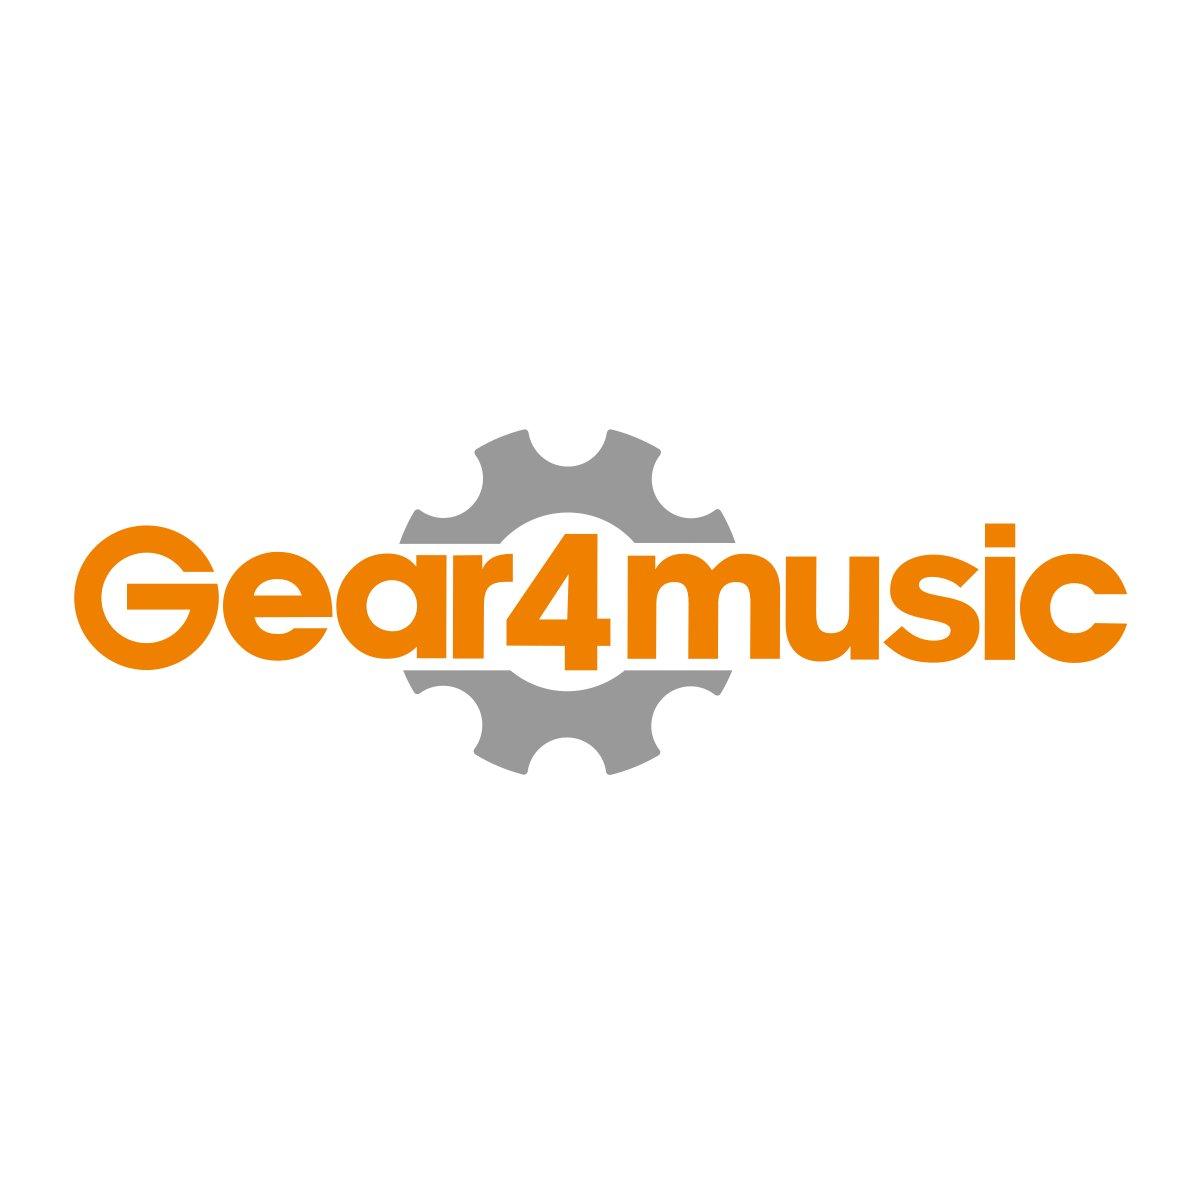 Funda de Guitarra Eléctrica Profesional por Gear4music